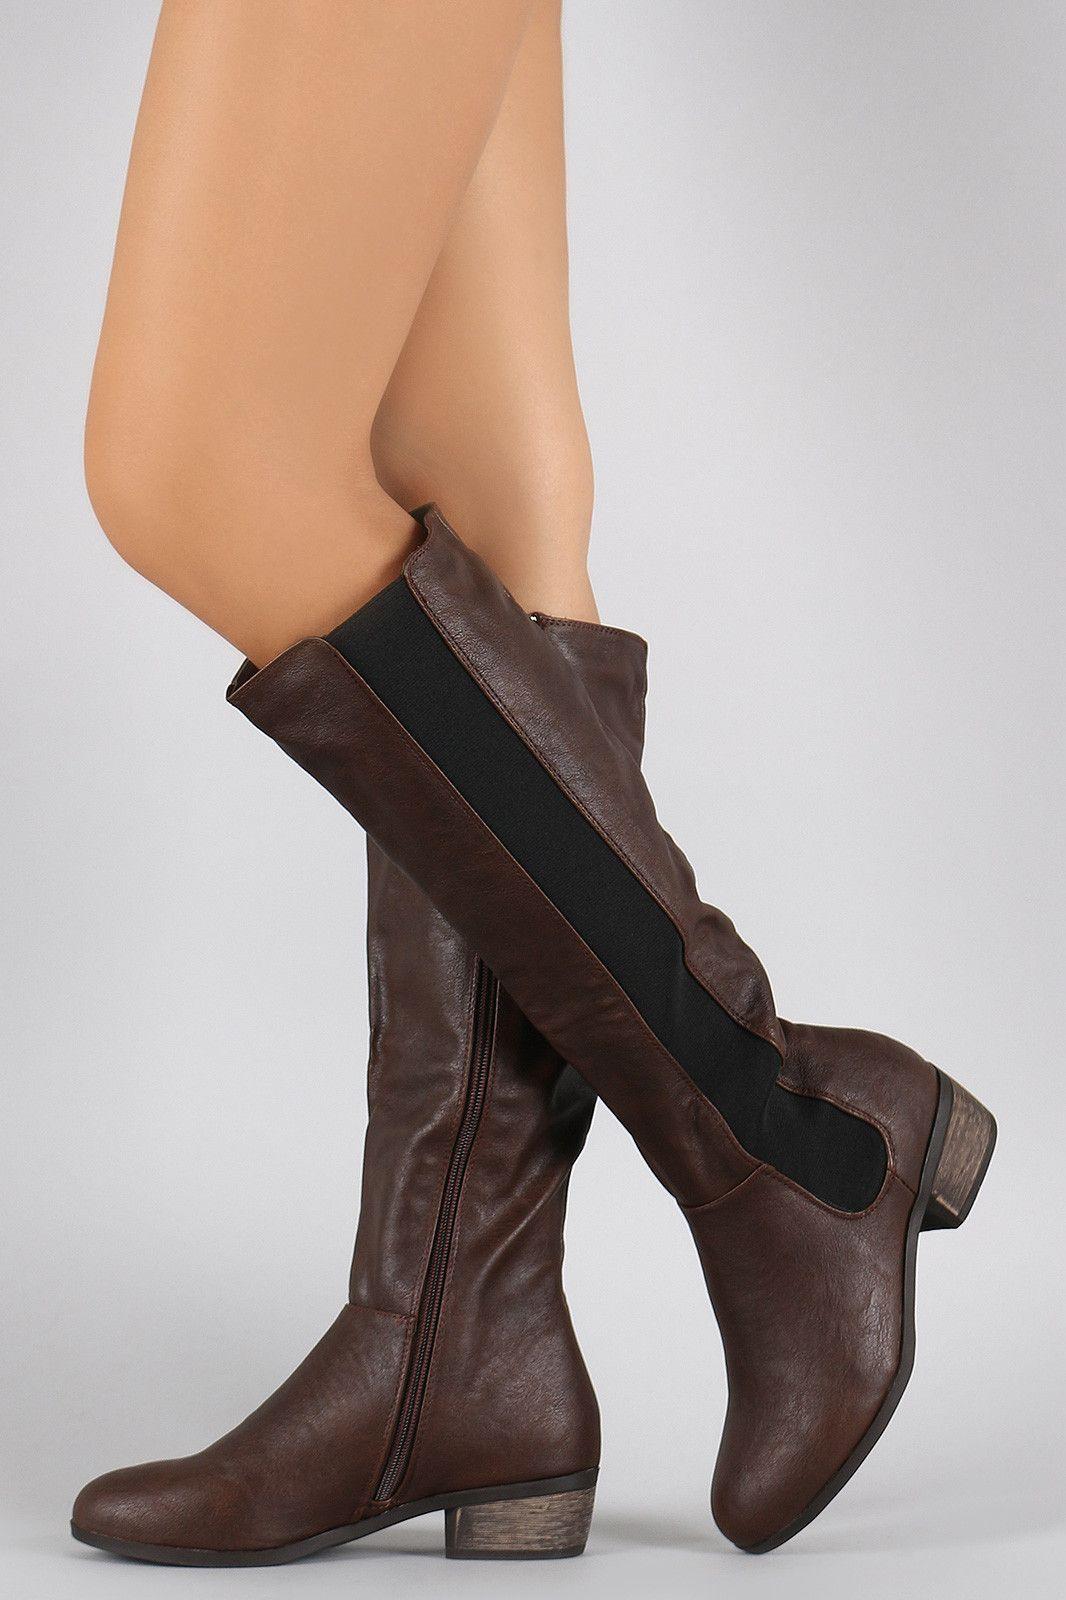 Dollhouse Elasticized Riding Knee High Boots